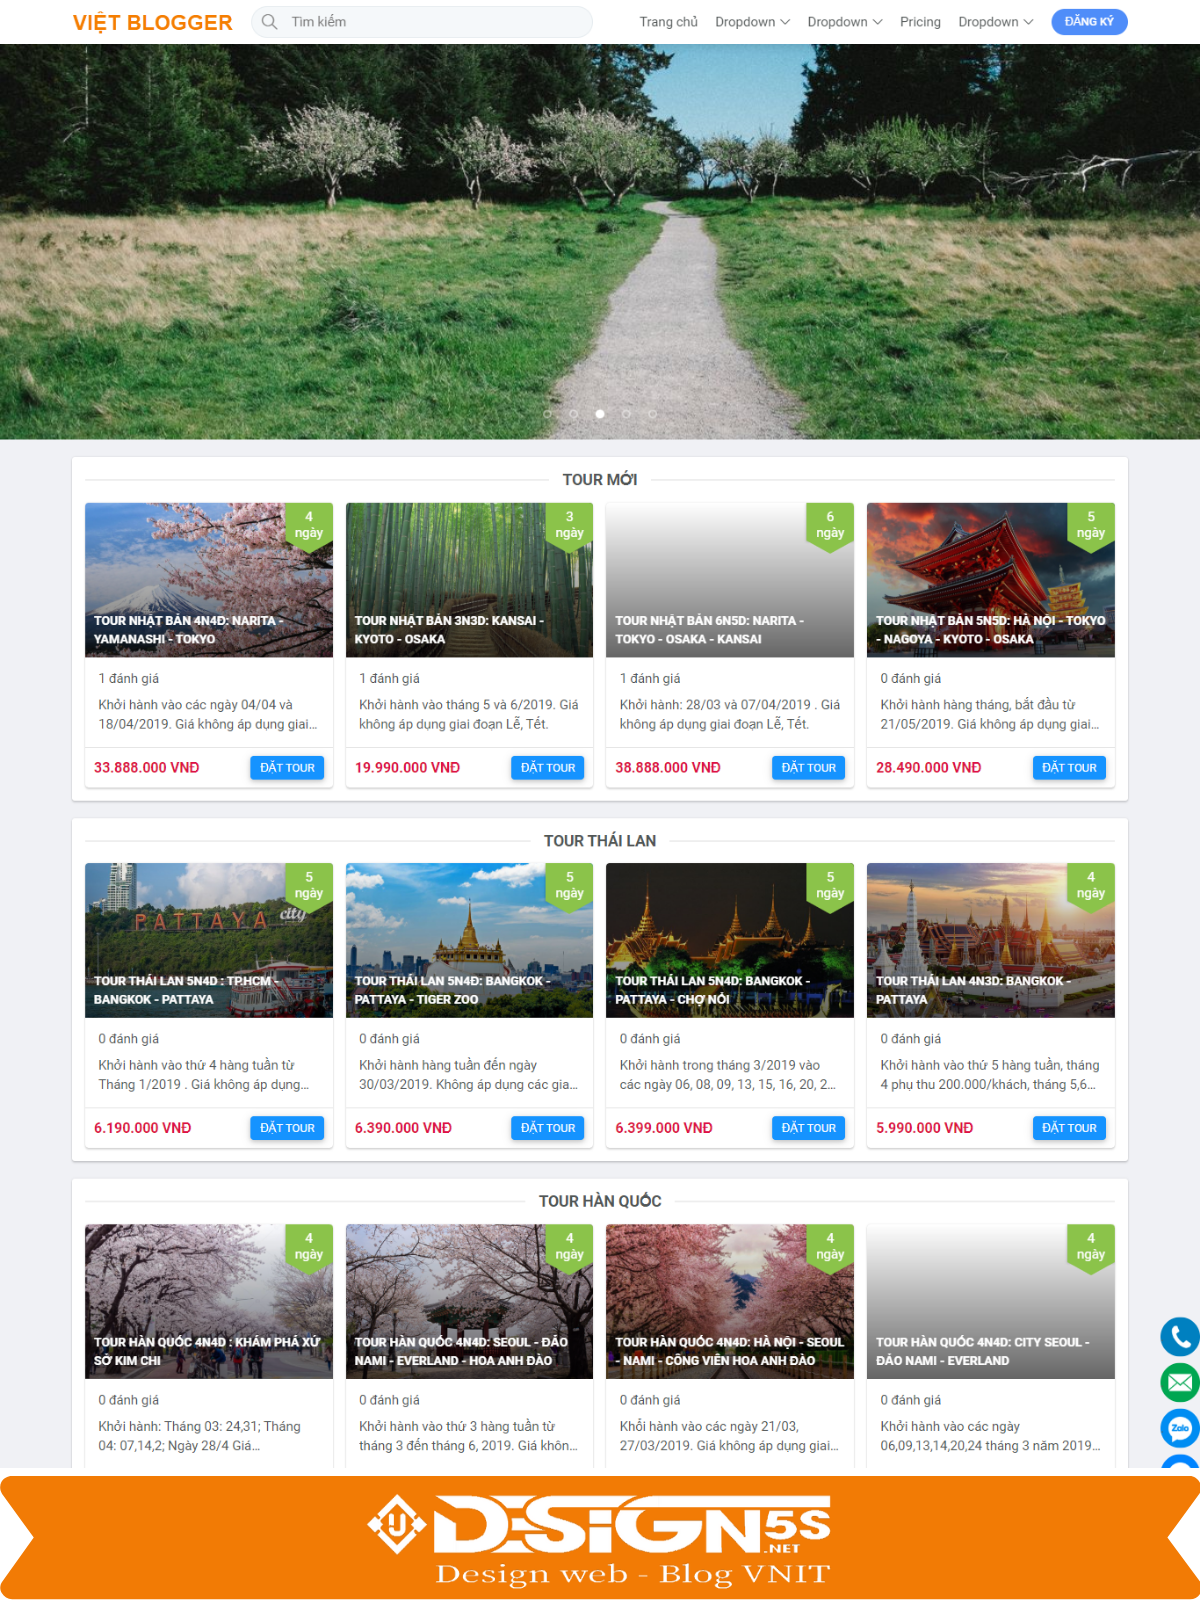 Template blogspot đặt du lịch book tour online tuyệt đẹp VSM56